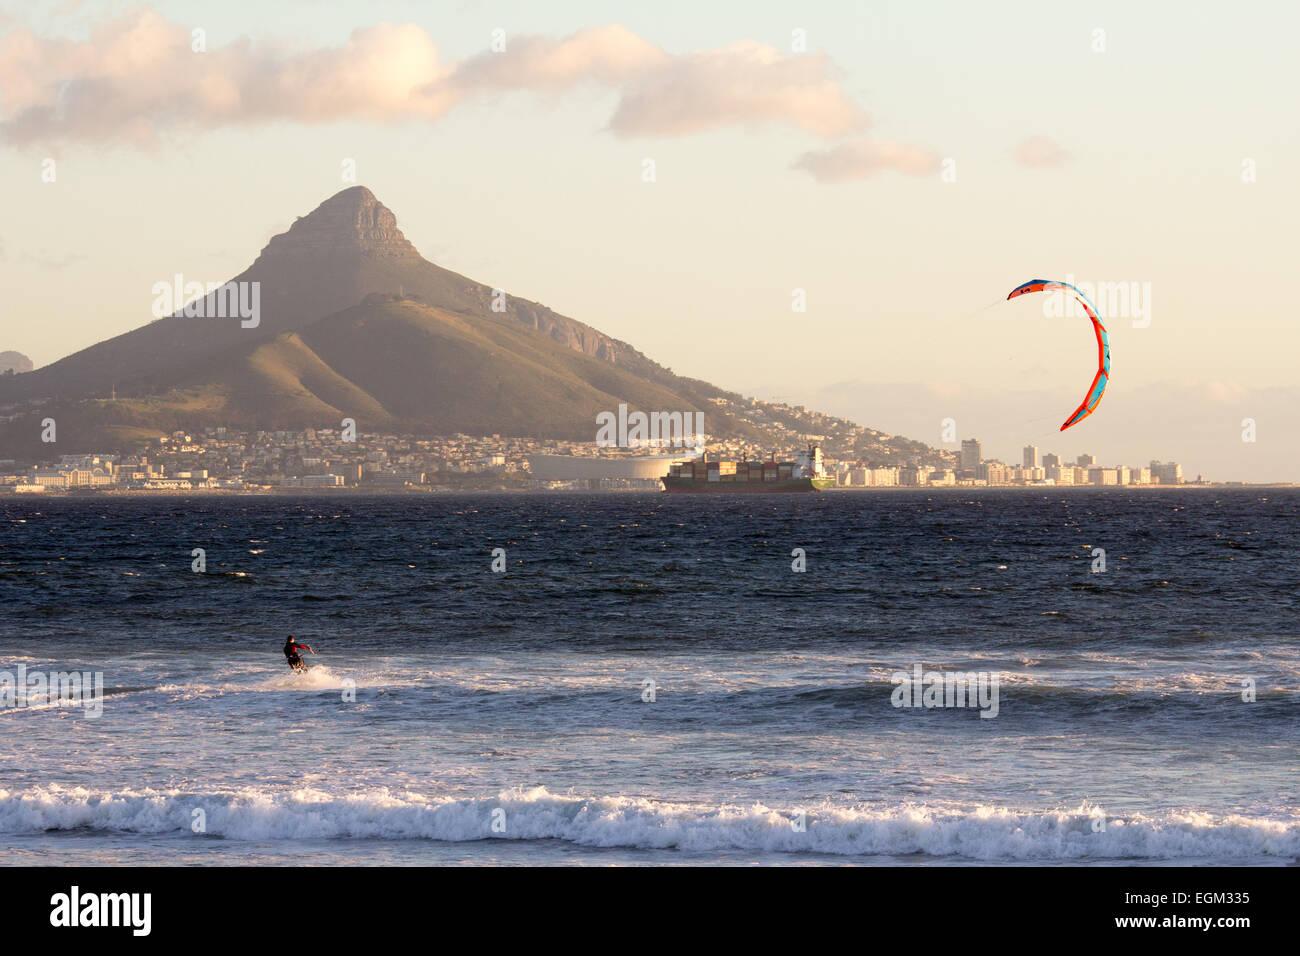 Windsurf en Cape Town Imagen De Stock